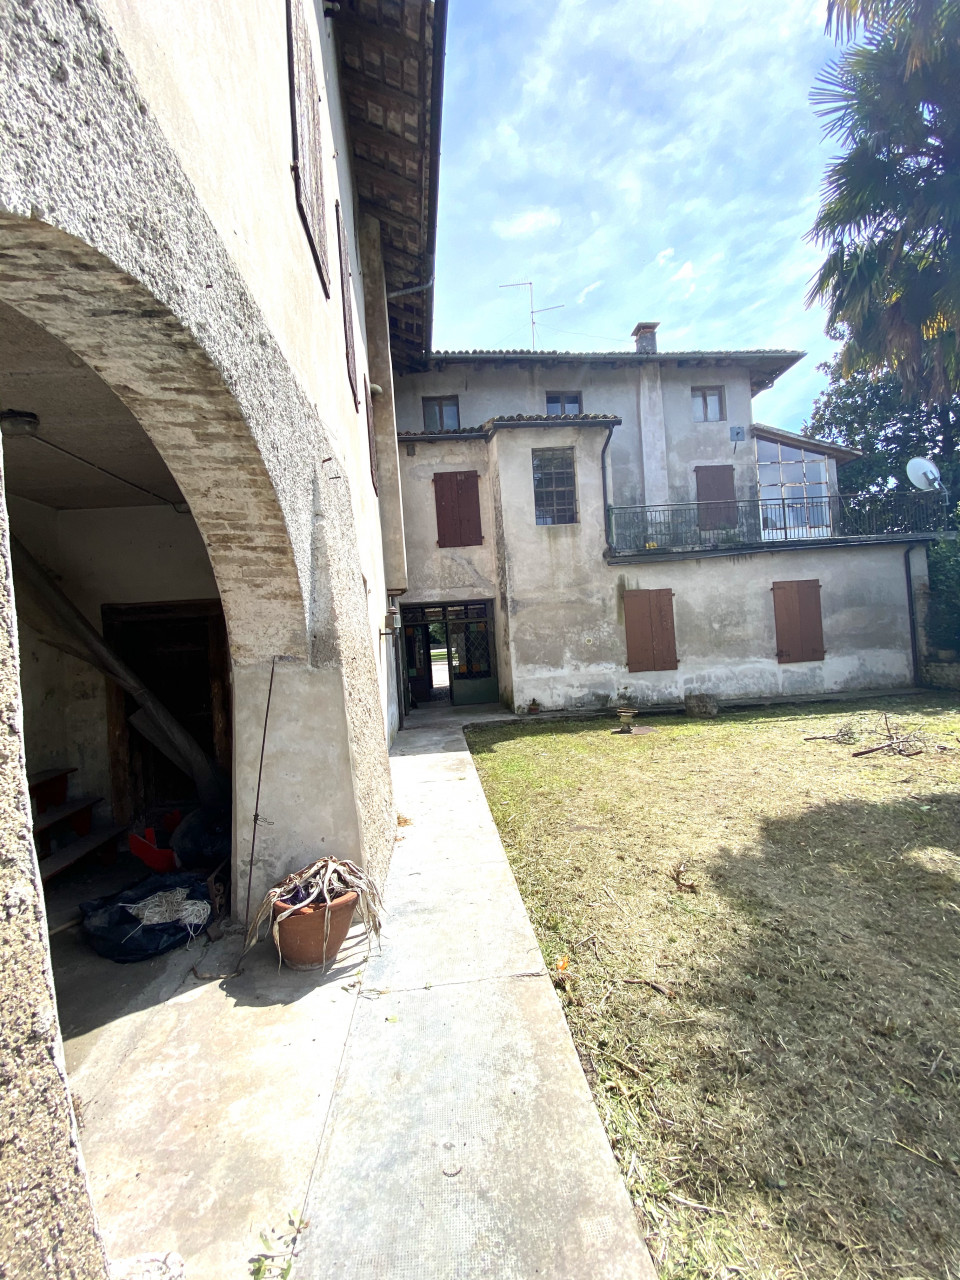 Dimora Storica in vendita in Centro a Valvasone - Rif.P1 https://images.gestionaleimmobiliare.it/foto/annunci/200820/2282895/1280x1280/002__img_3455.jpg